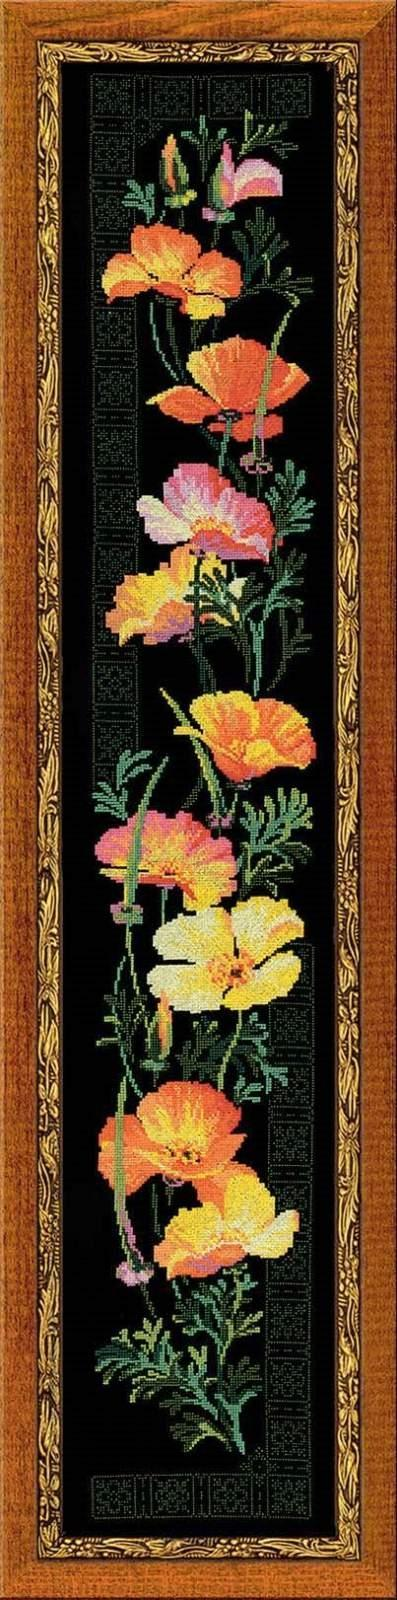 Вышивка на черно цветы